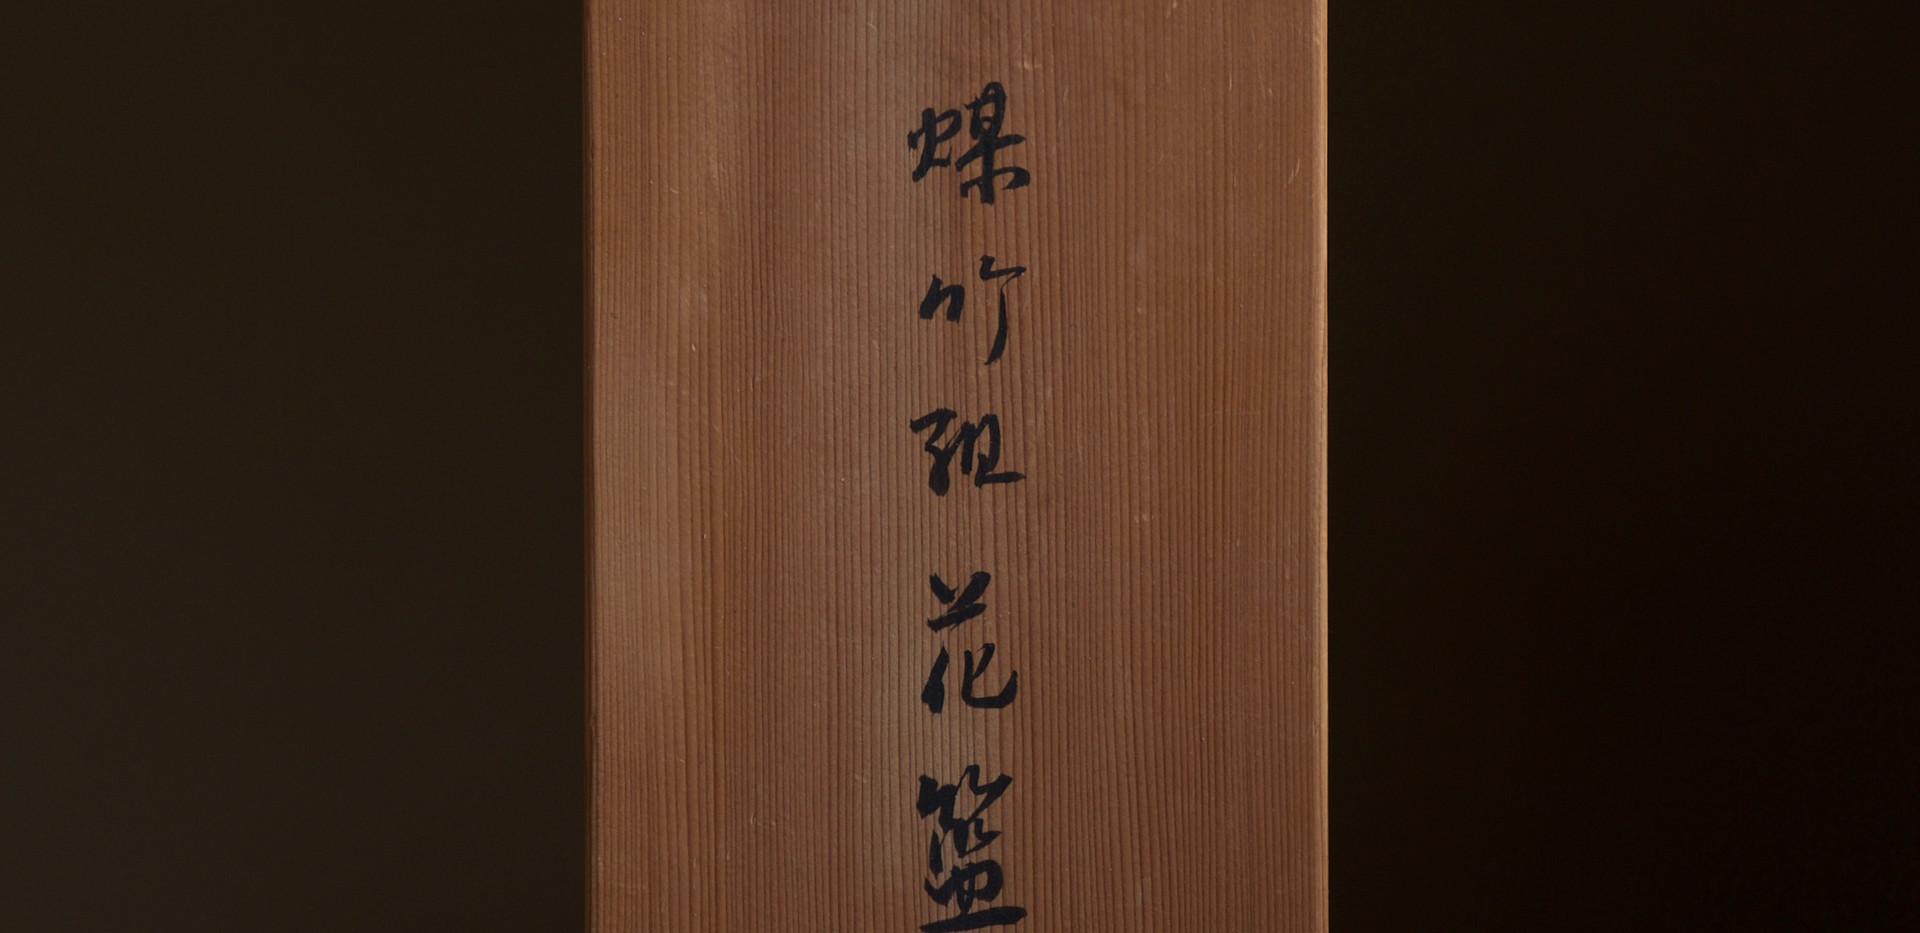 Flower basket by Higashi Takesonosai 06.jpg